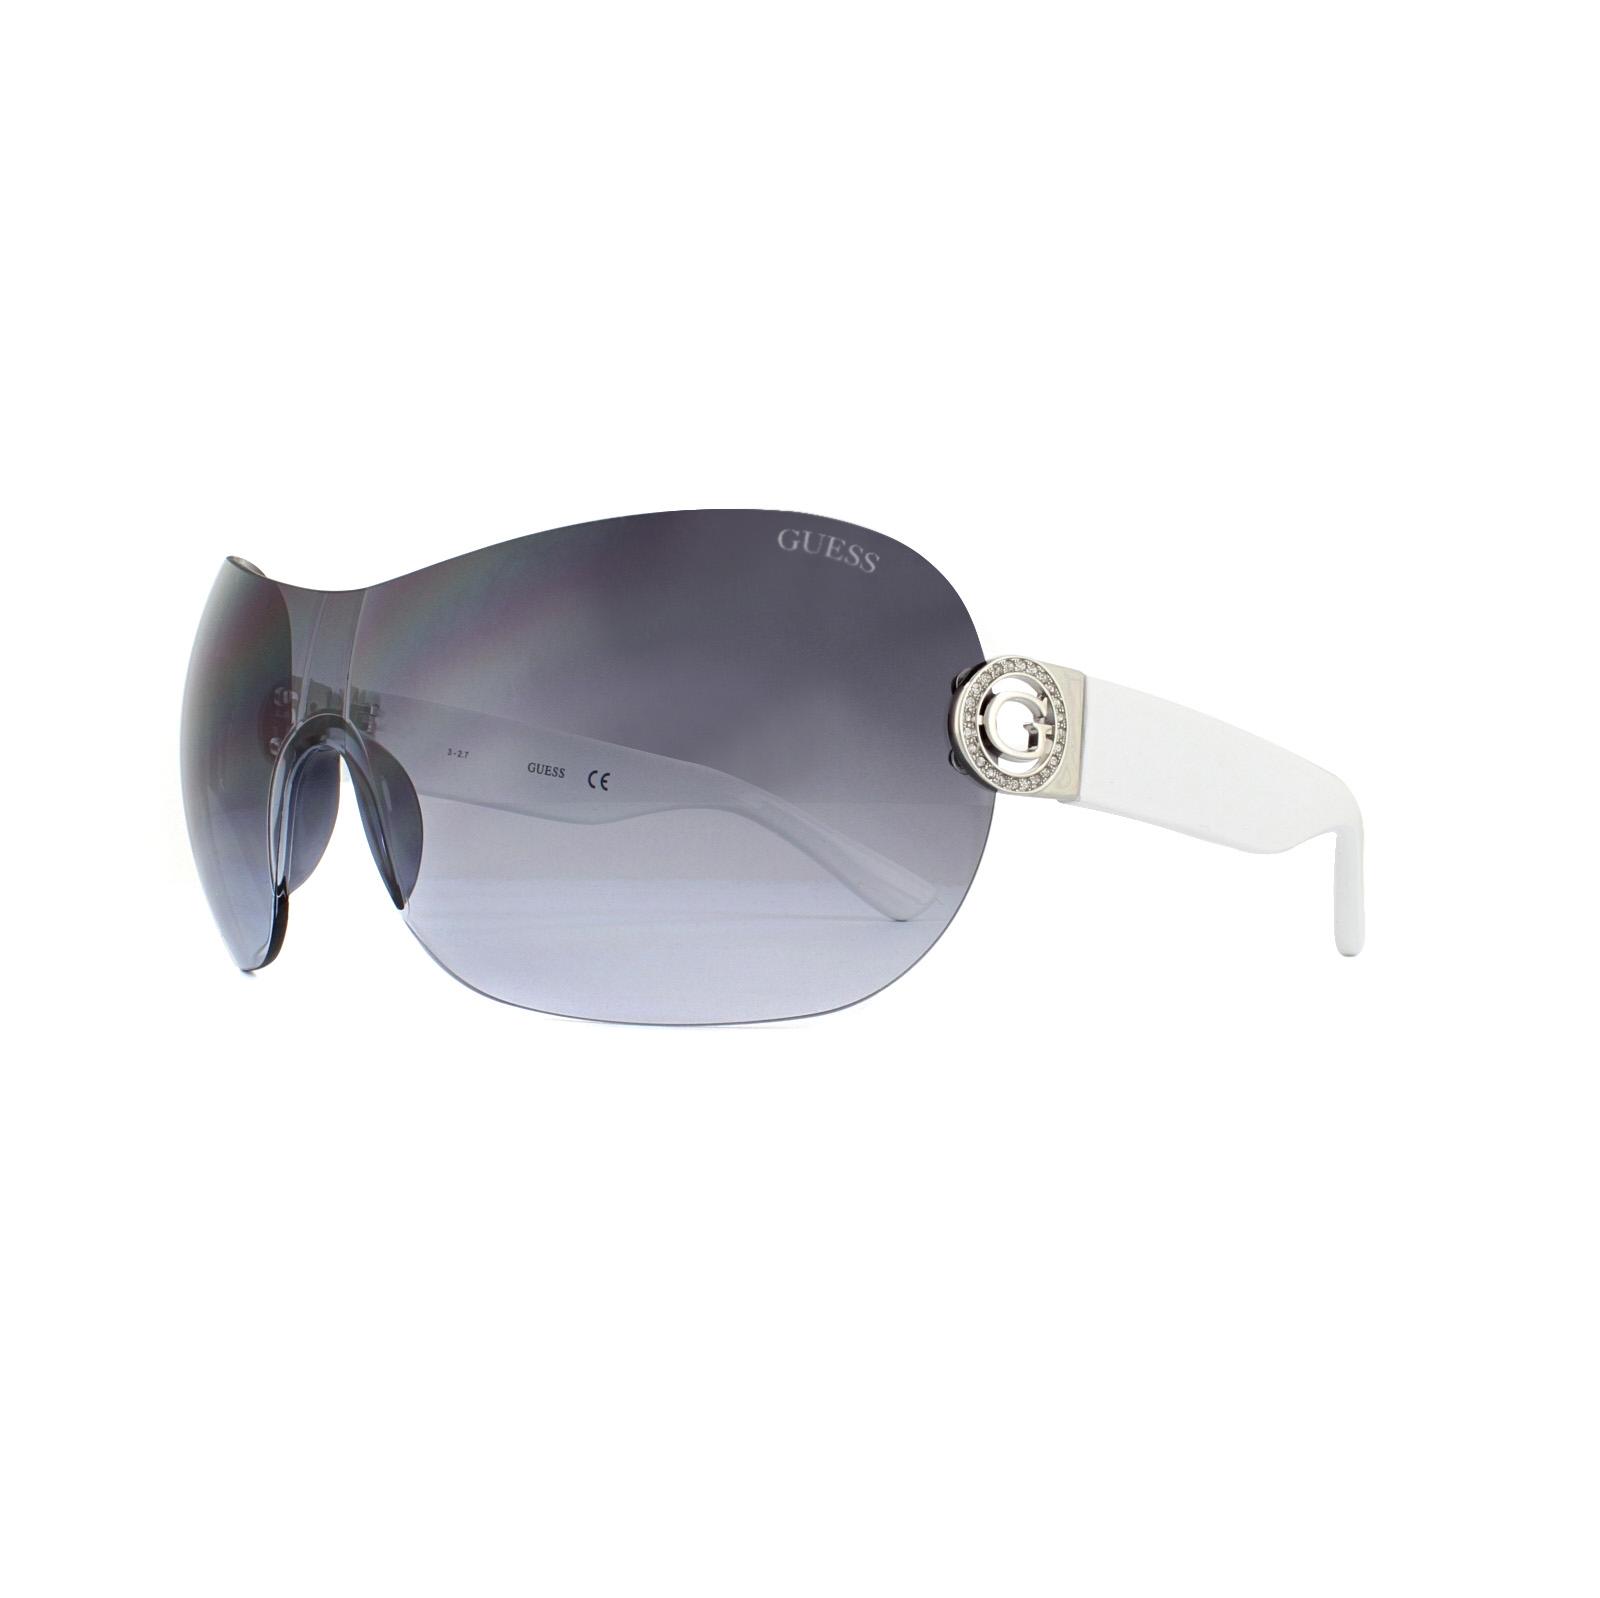 71d979d516c Guess Sunglasses GU7407 21C White Smoke Mirror 664689750757